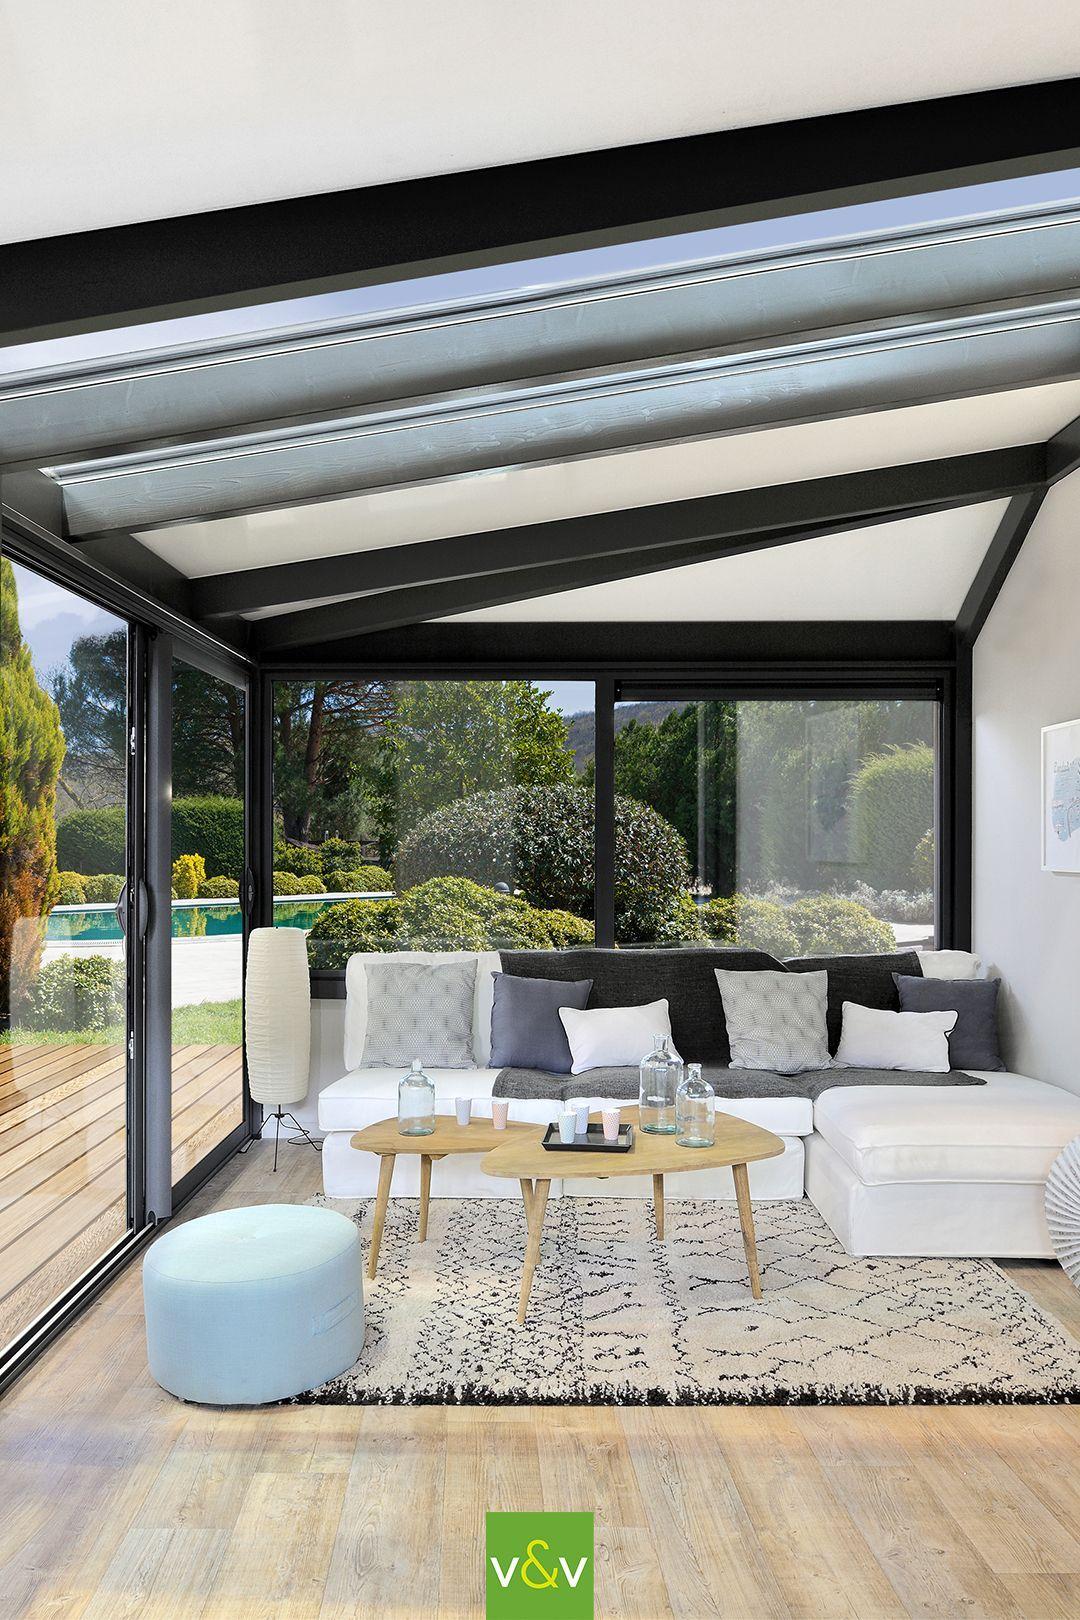 La Veranda Alizee Alizee Veranda Sunroom Designs Garden Room Extensions Pergola